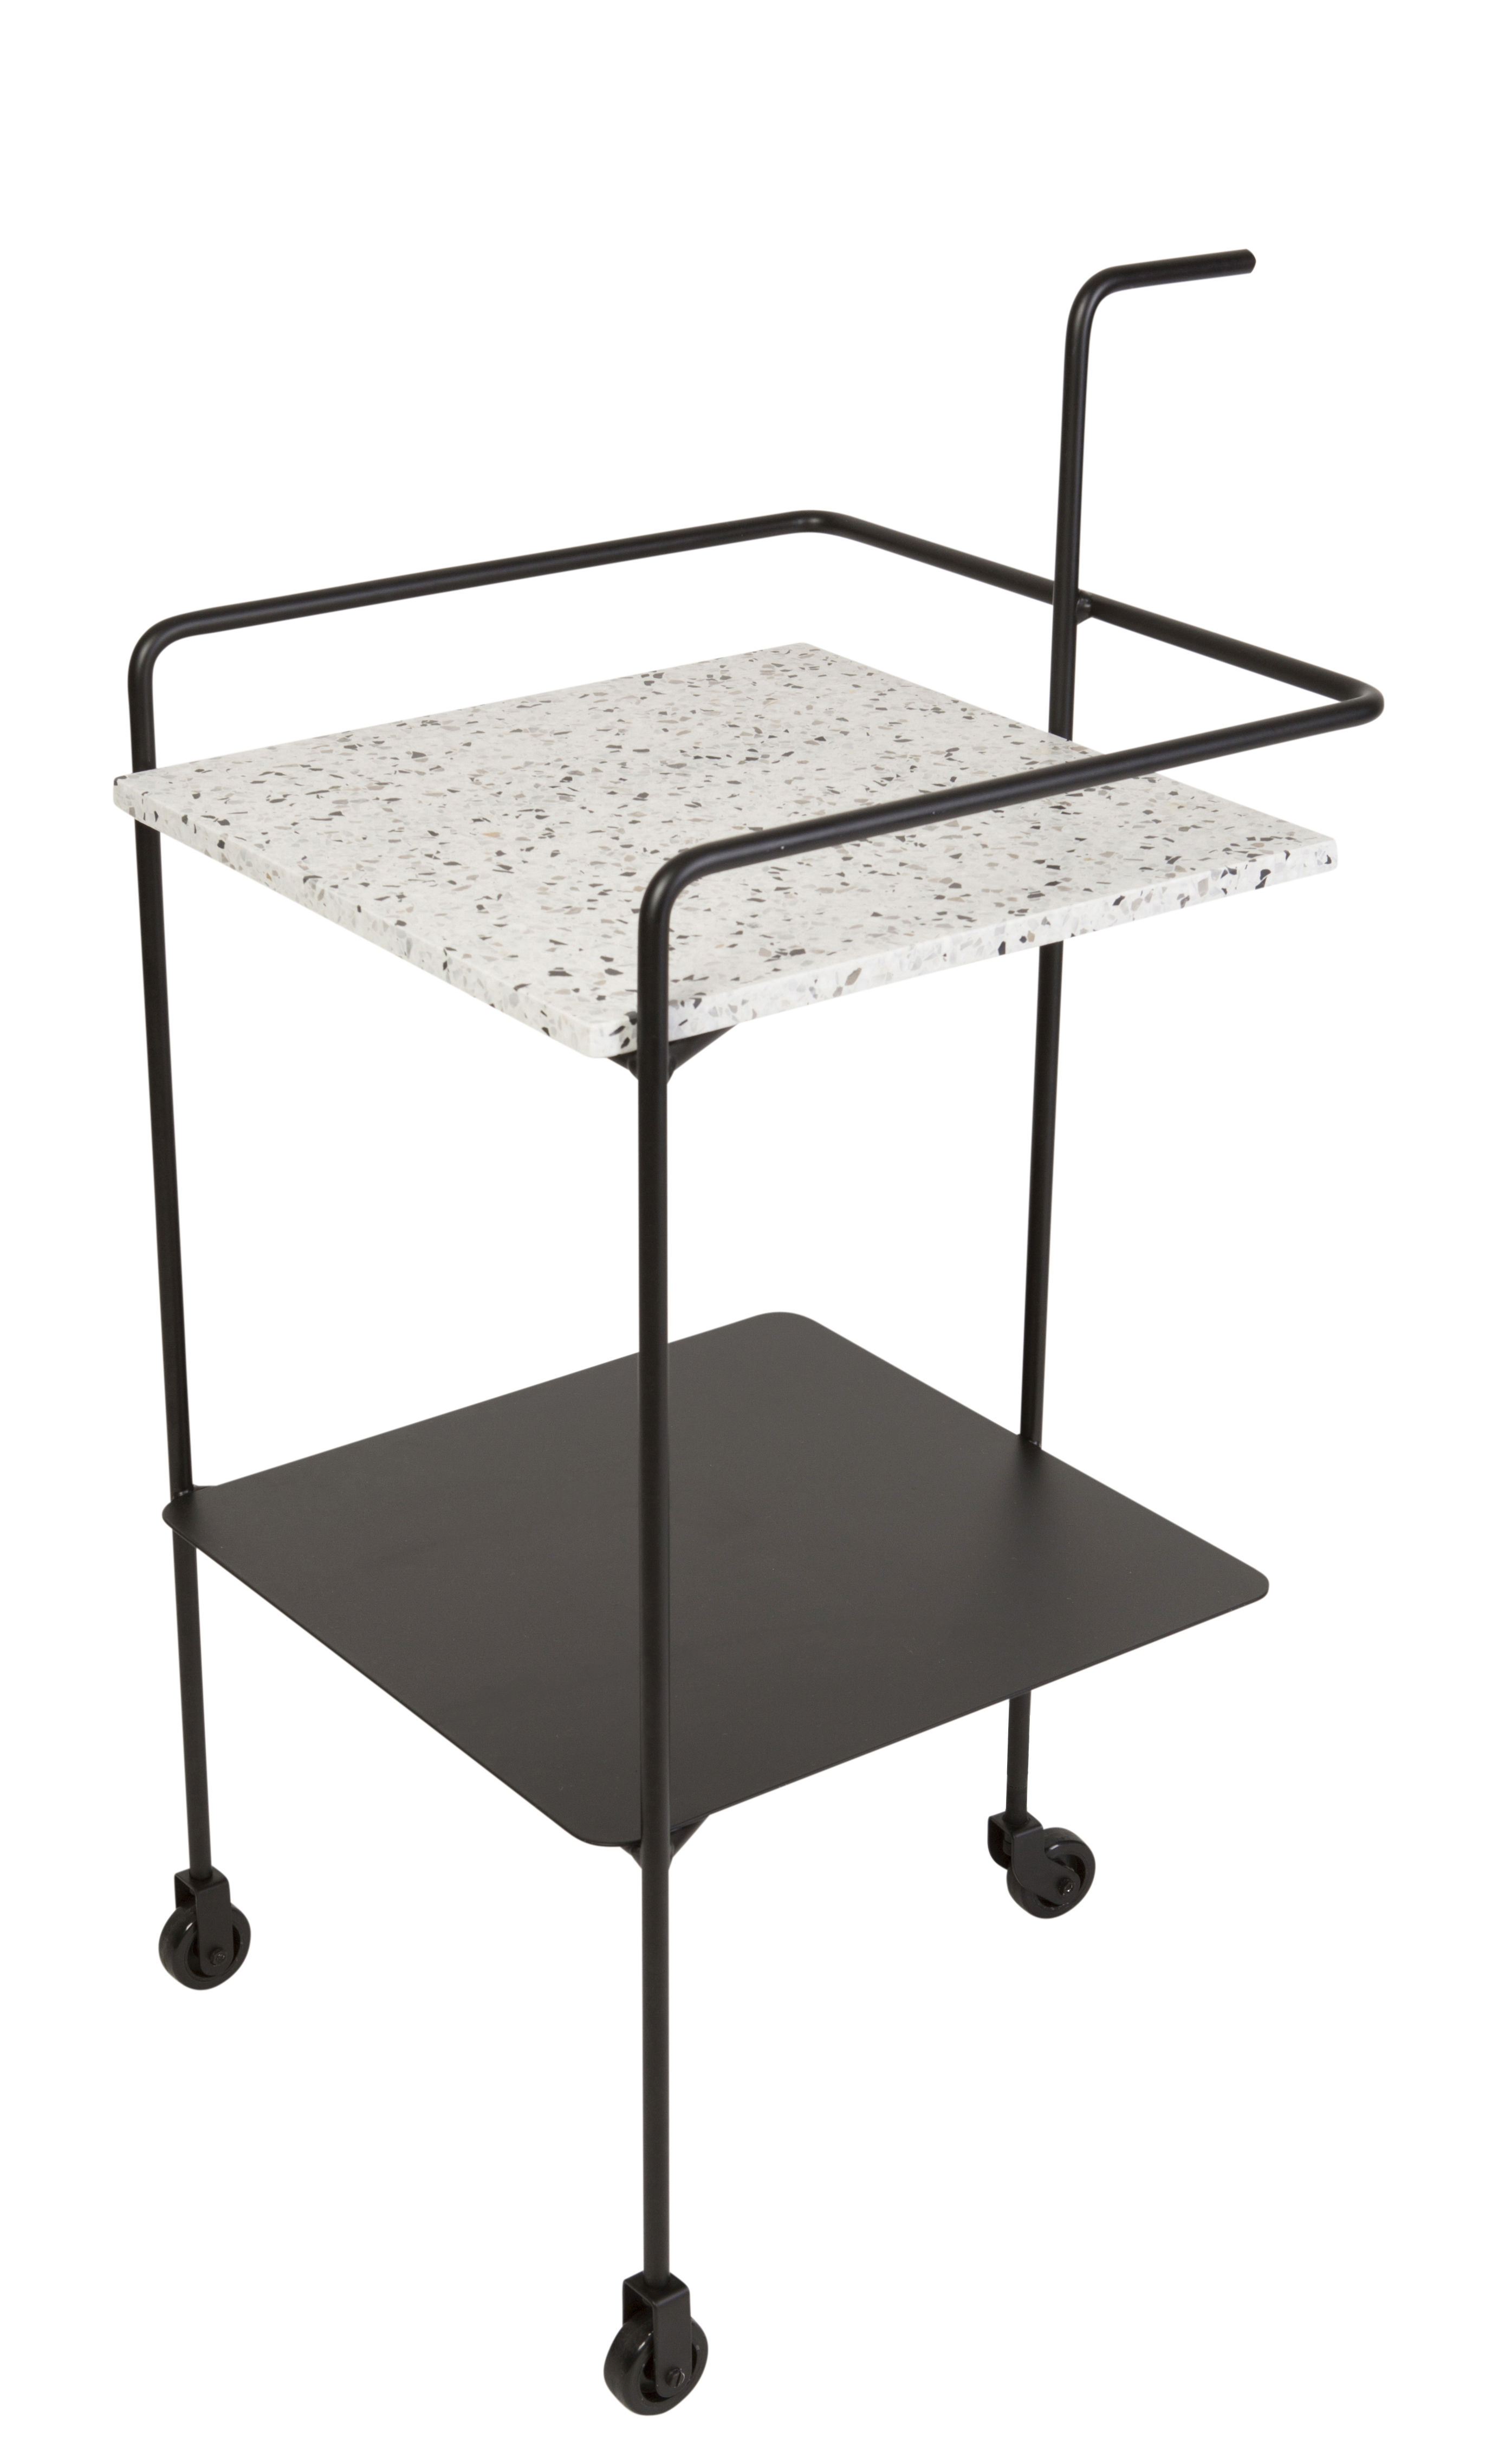 Furniture - Miscellaneous furniture - Confetti Dresser - On wheels by OK Design pour Sentou Edition - Black / Black & white tray - Epoxy lacquered metal, Terrazzo